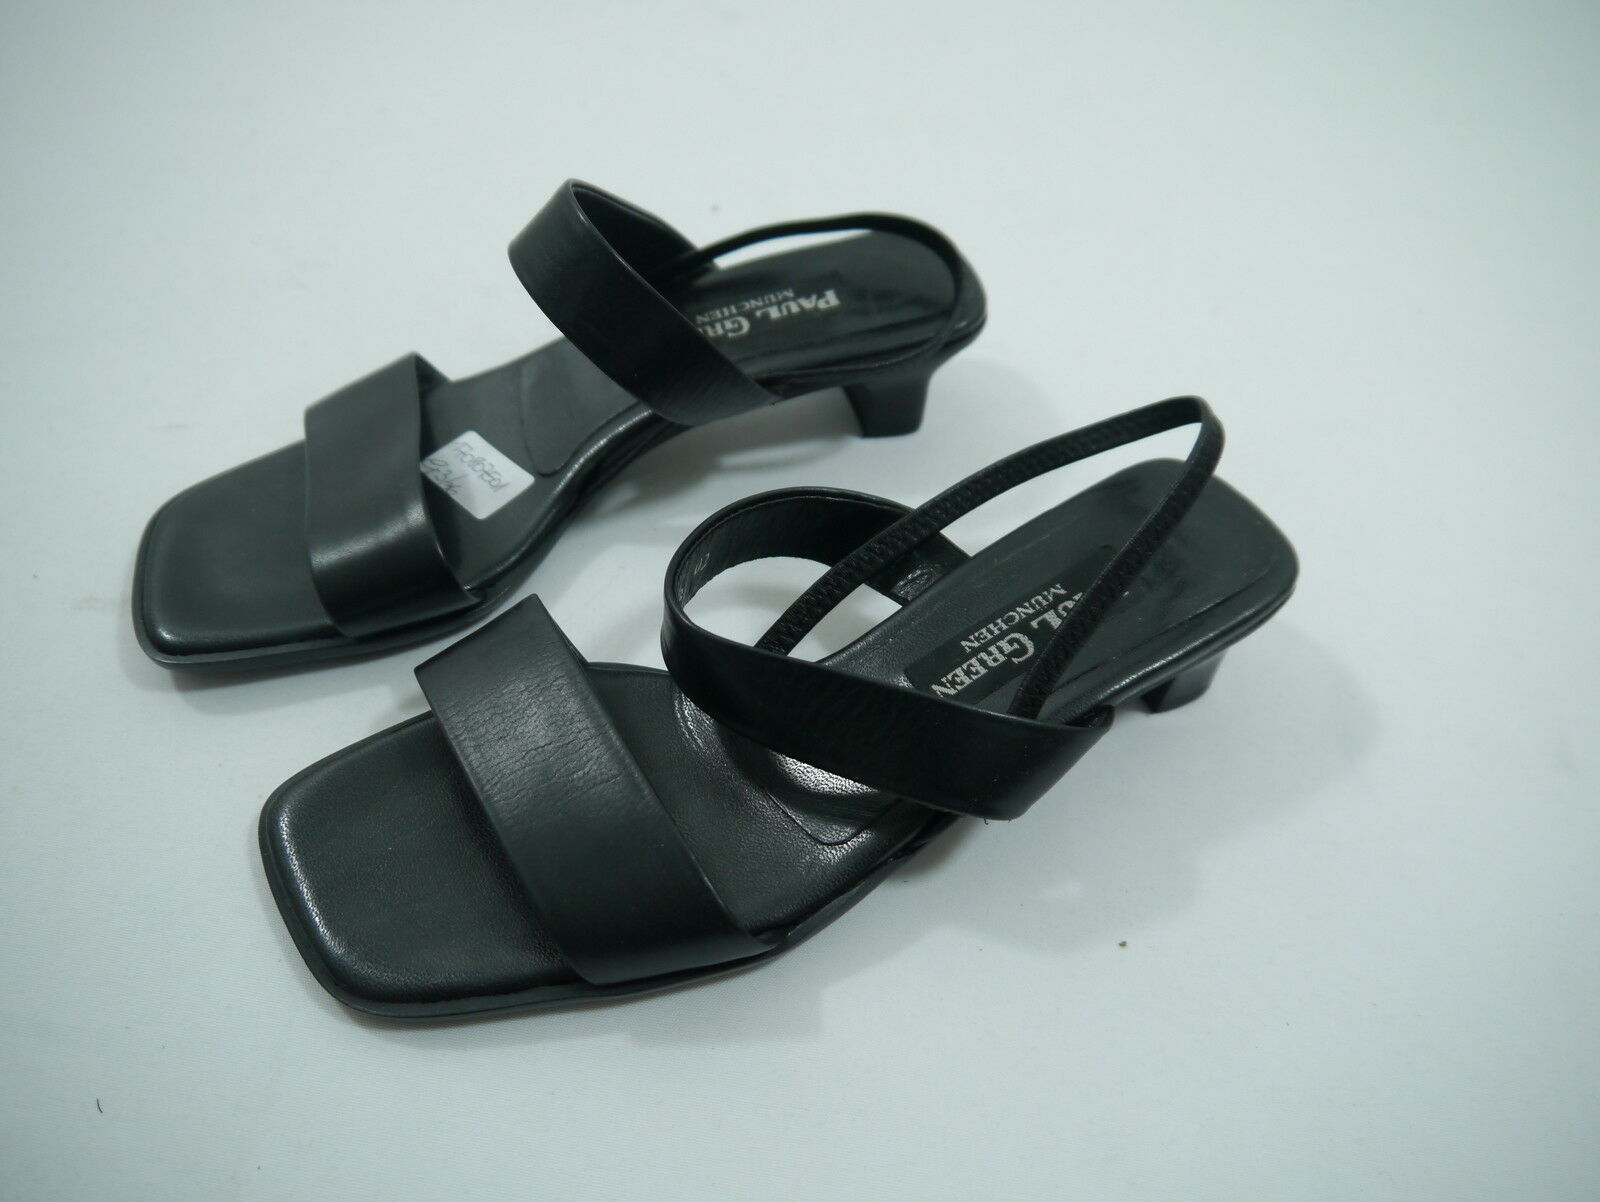 # PAUL GREEN Da. Sandalee Sandaleette schwarz Leder Gr.3/36  wie neu